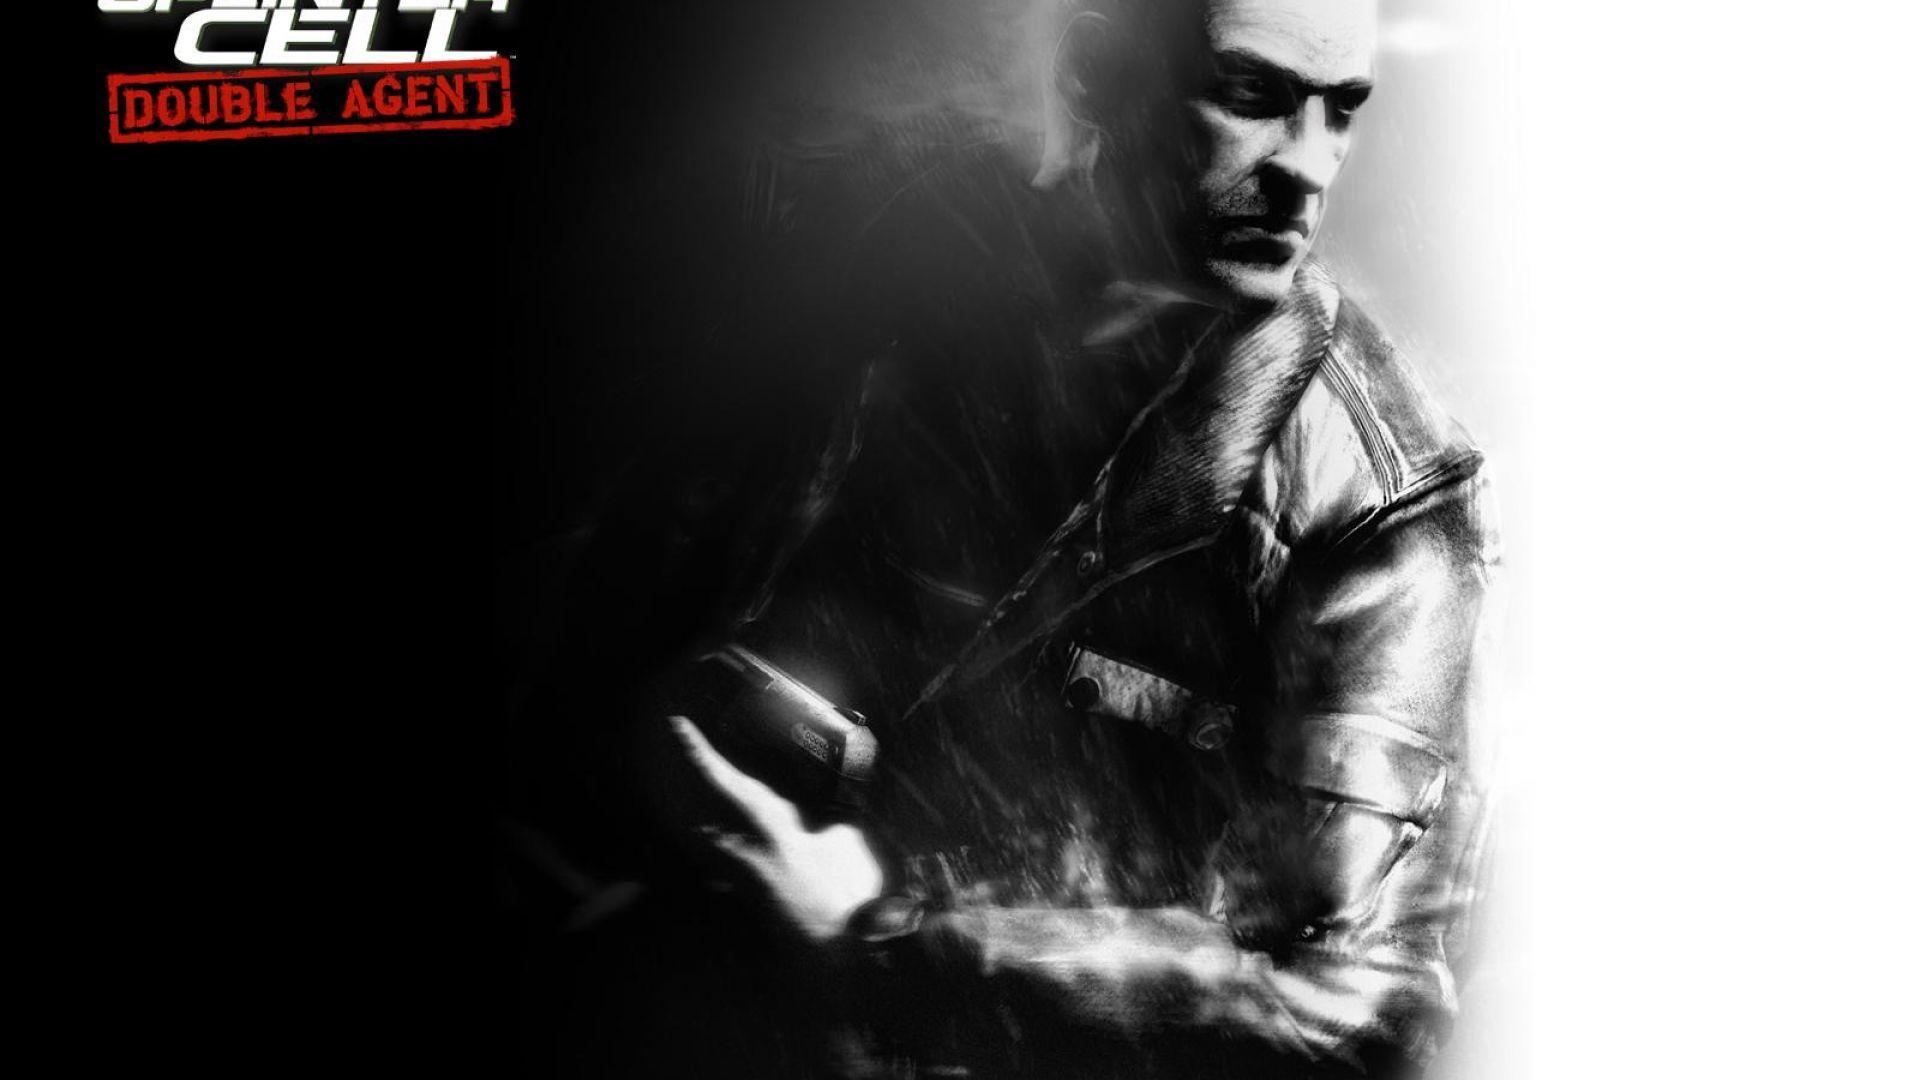 Tom Clancy's Splinter Cell: Double Agent wallpapers, Video ... |Splinter Cell Double Agent Wallpaper